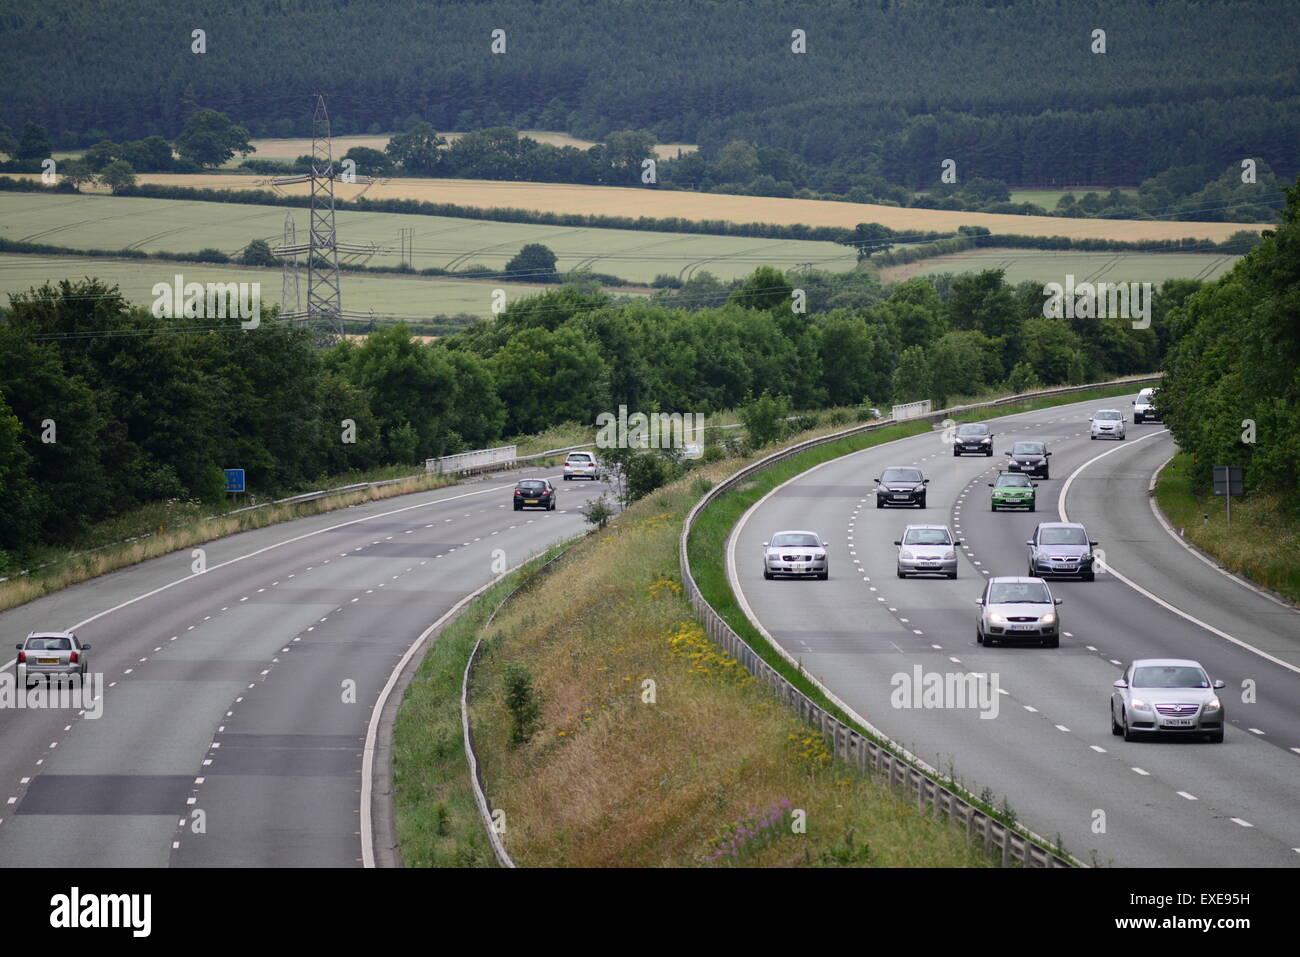 M1 Motorway Stock Photos & M1 Motorway Stock Images - Alamy